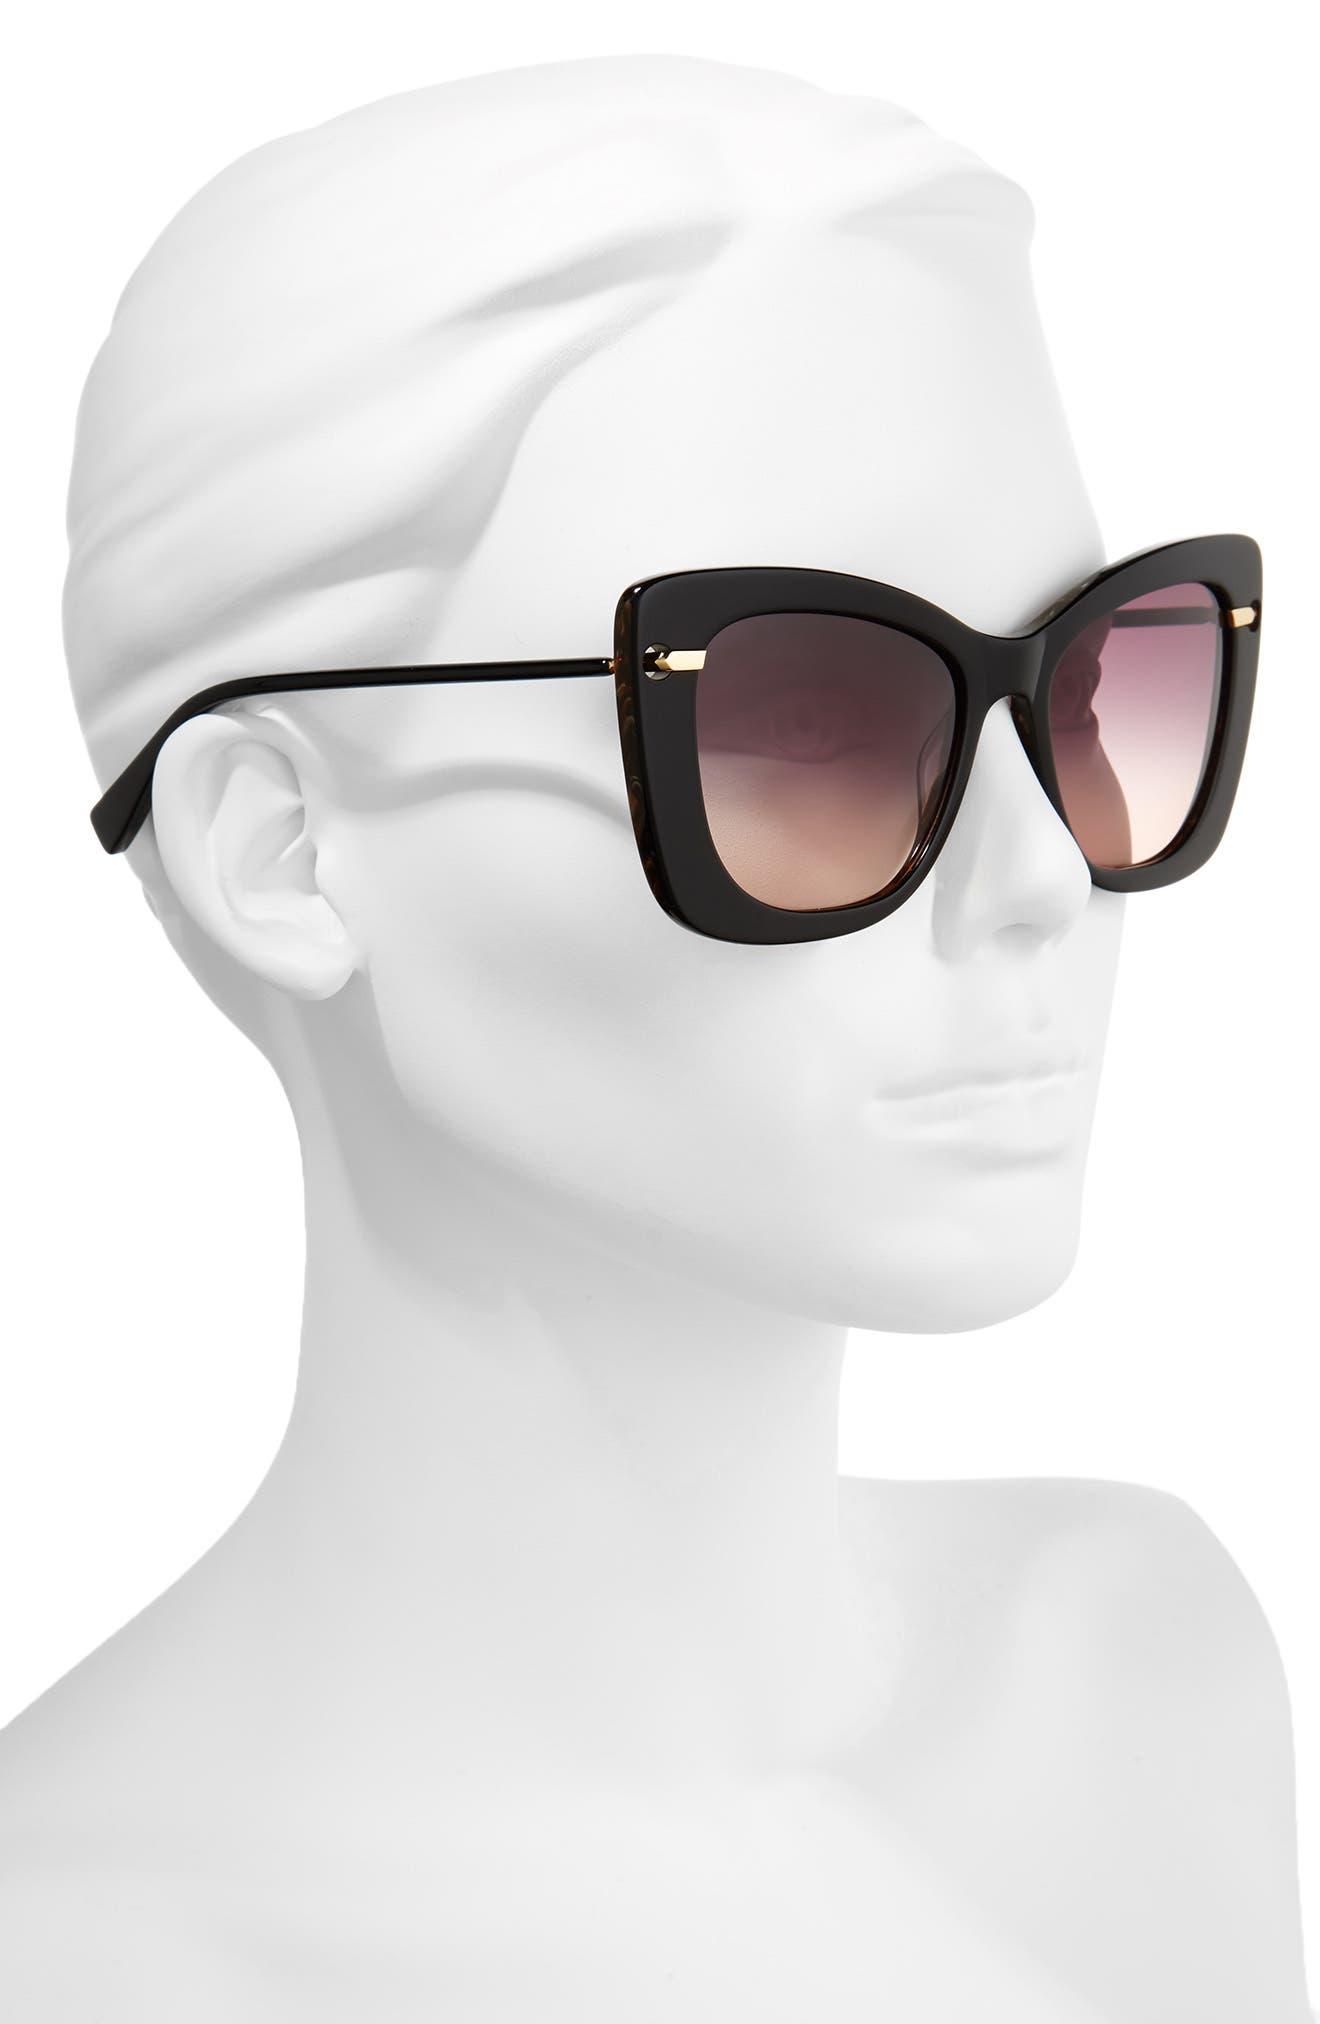 DEREK LAM,                             Clara 55mm Gradient Sunglasses,                             Alternate thumbnail 2, color,                             001